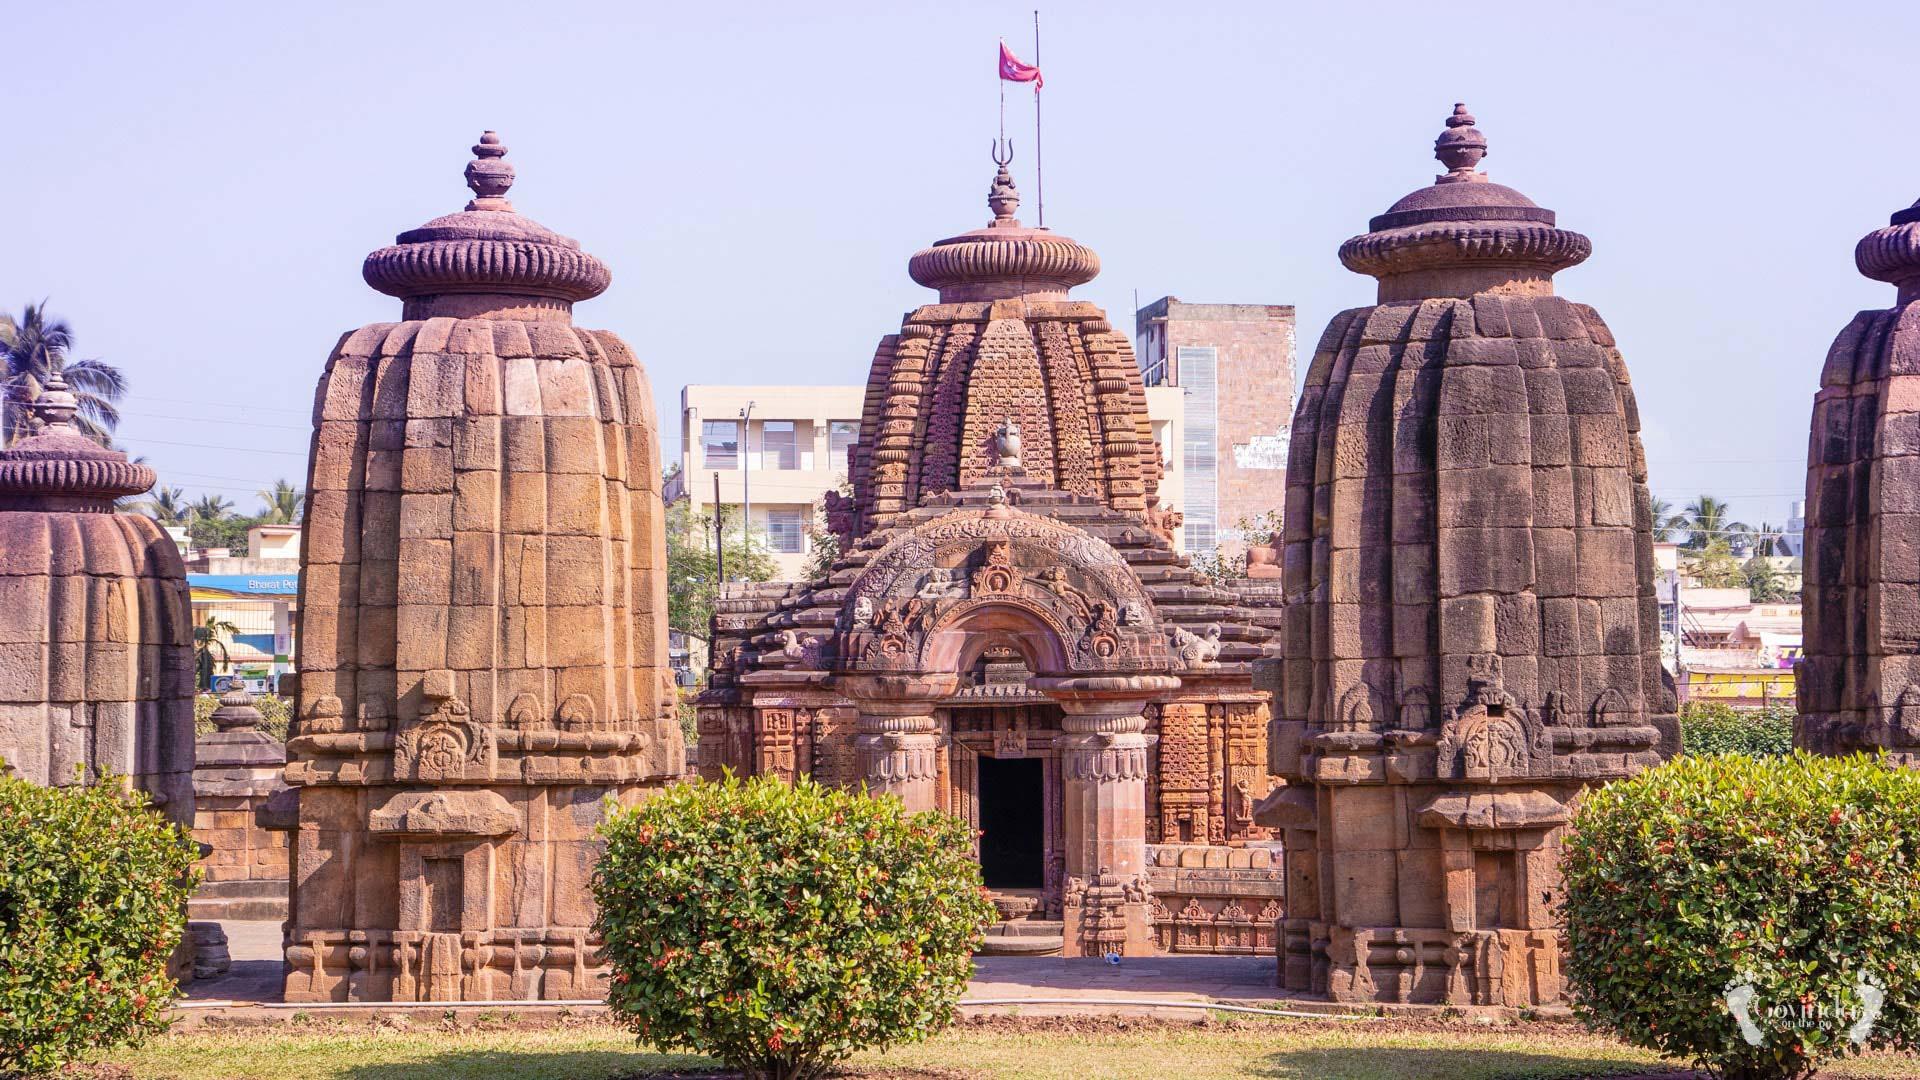 Shiva temple in Bhubaneswhar